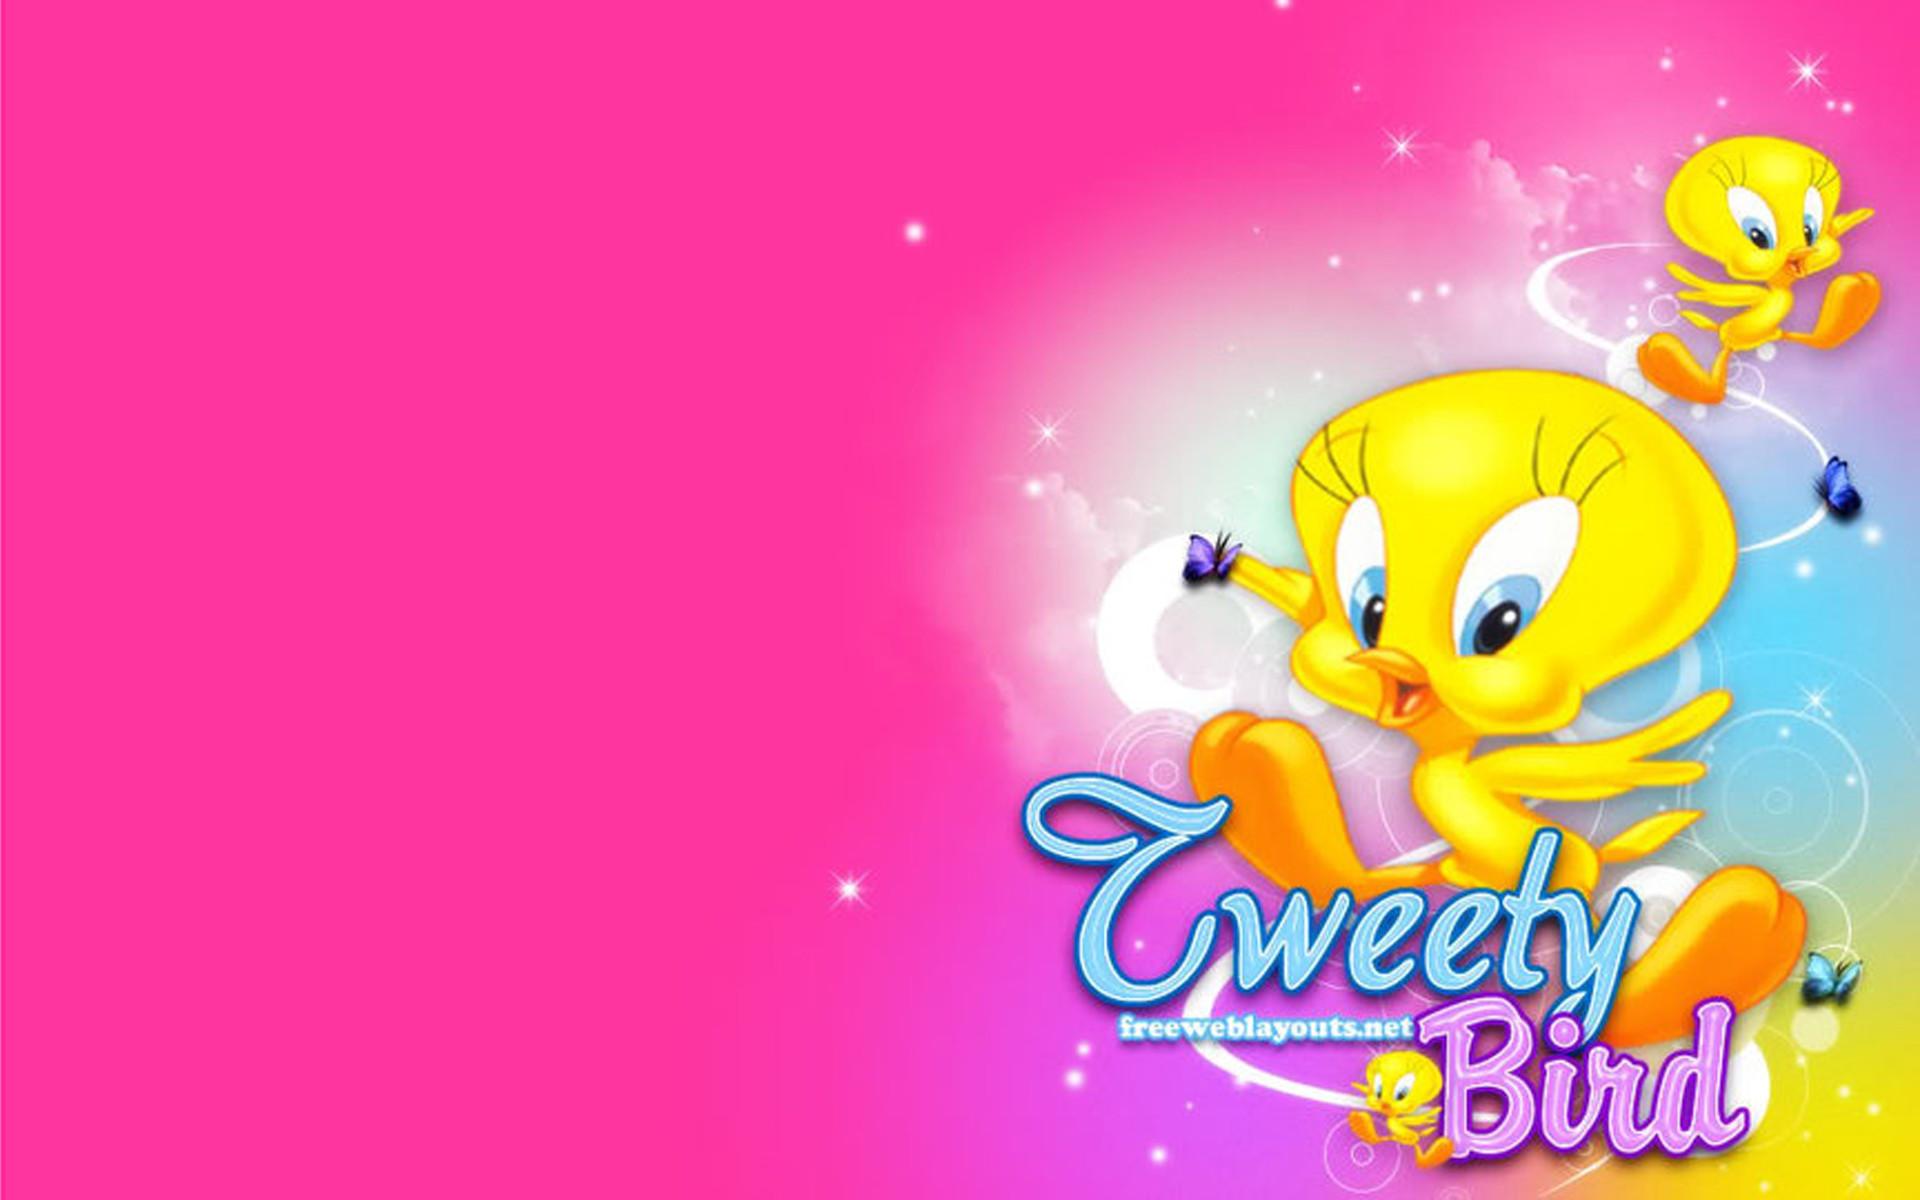 Download Cute Tweety Wallpapers Tweety Bird Backgrounds 183 ①